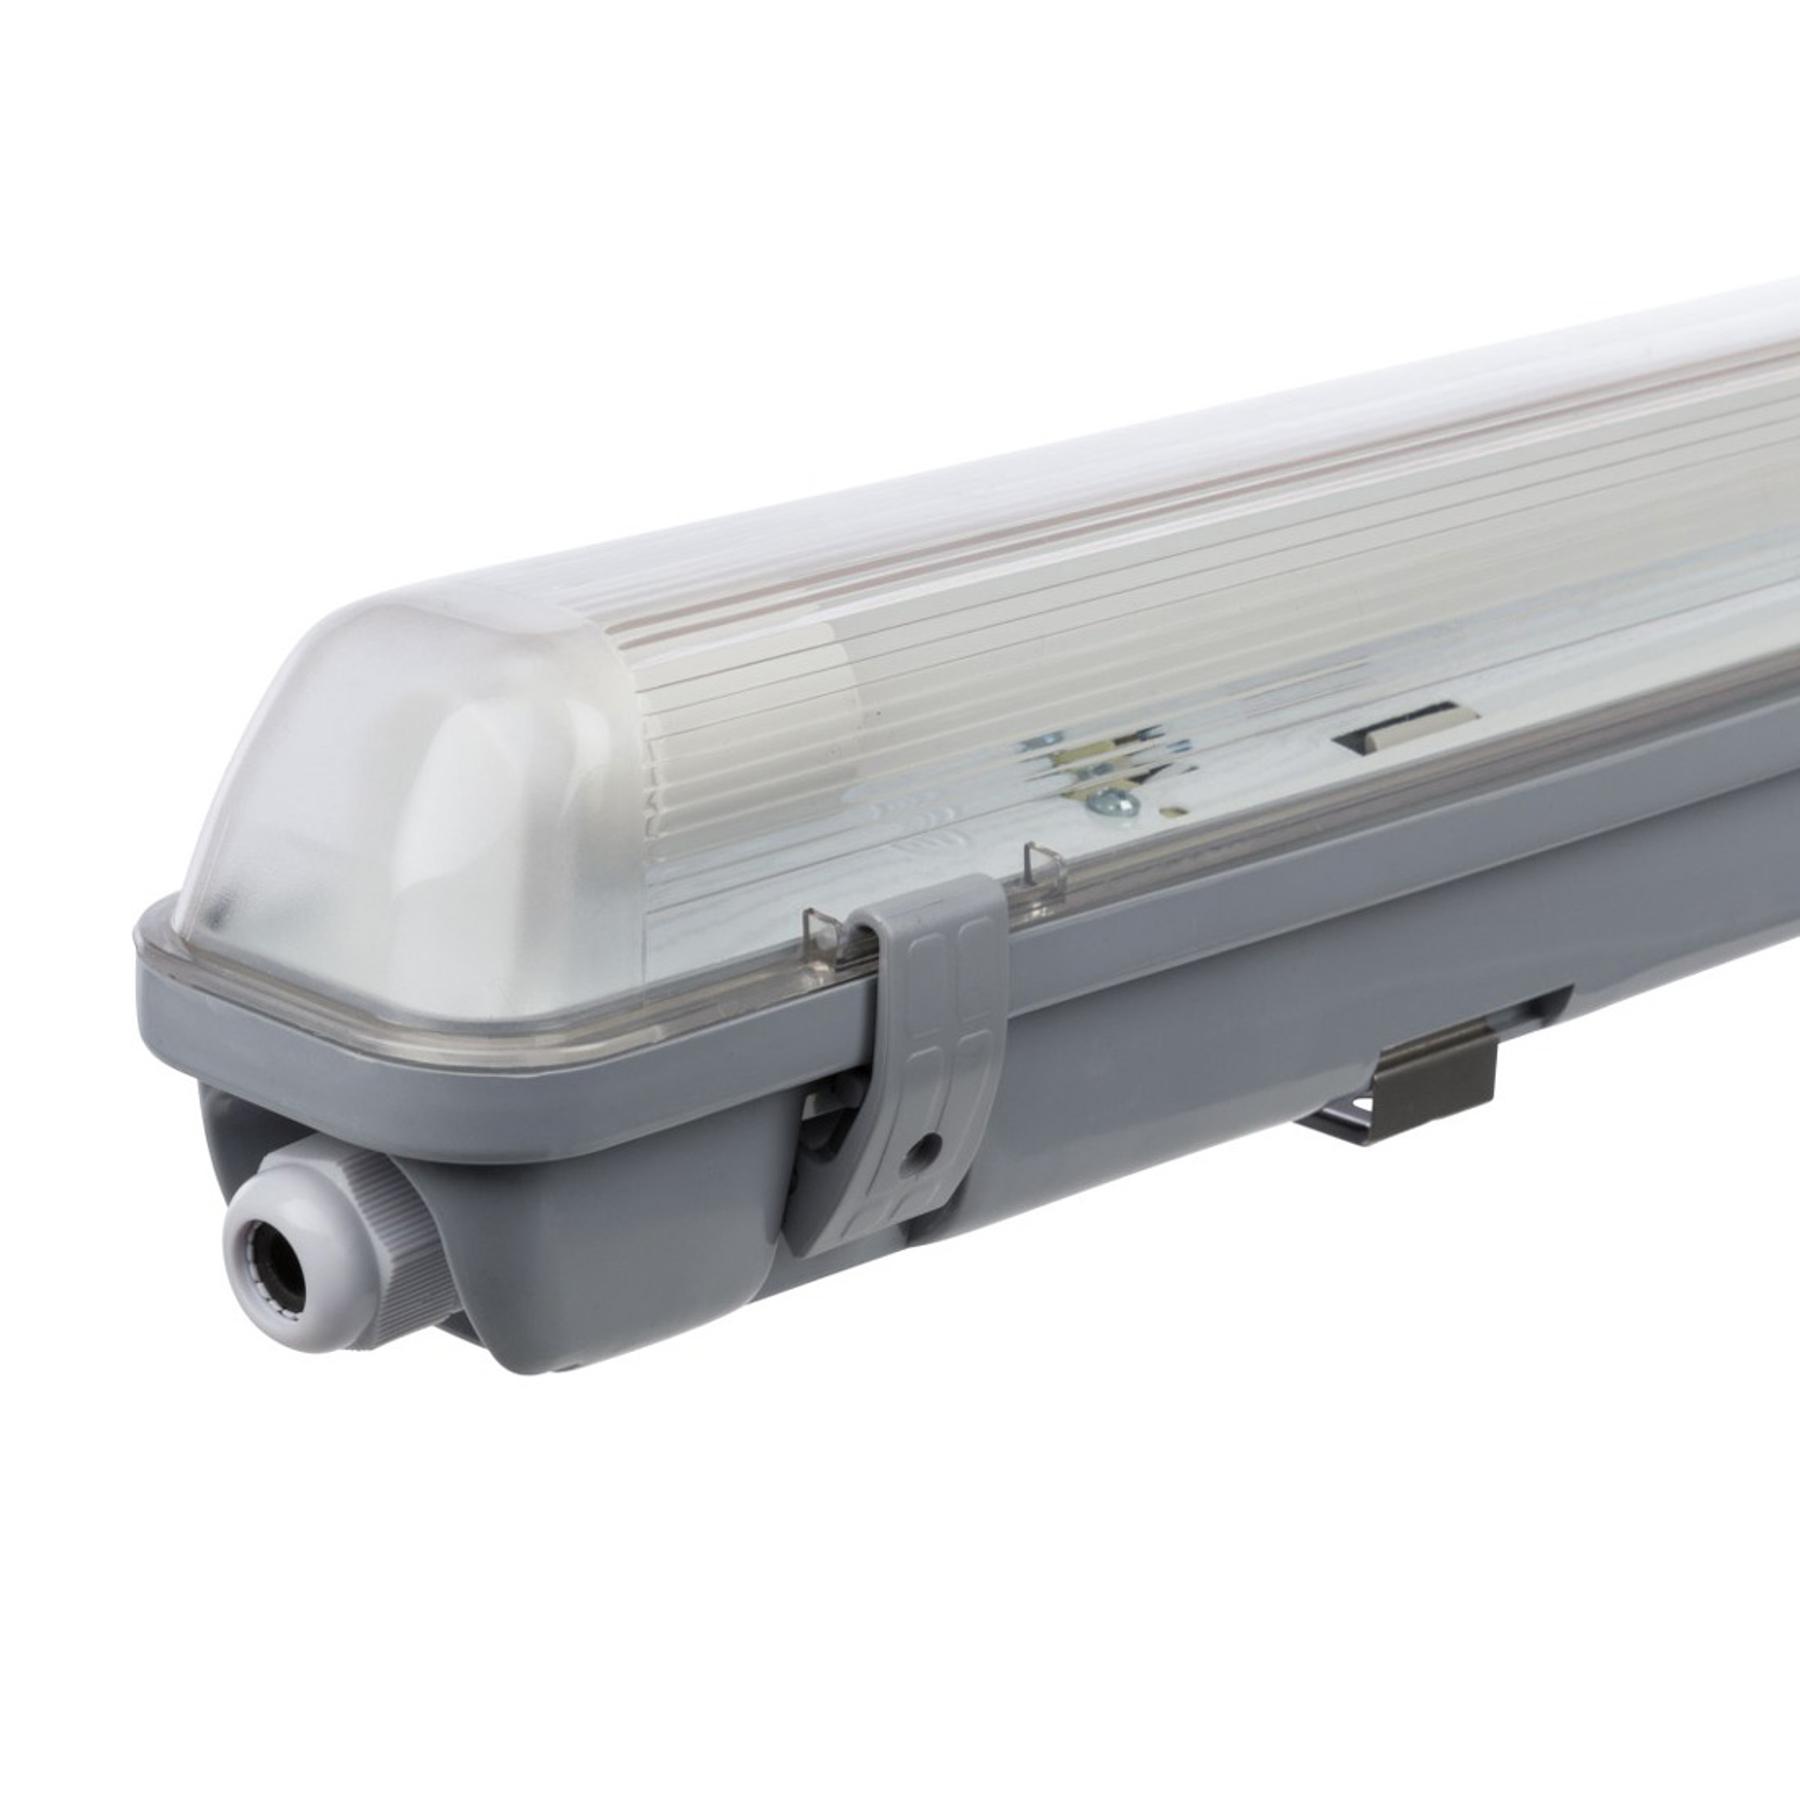 Aqua-Promo LED plafondlamp één lamp 120cm